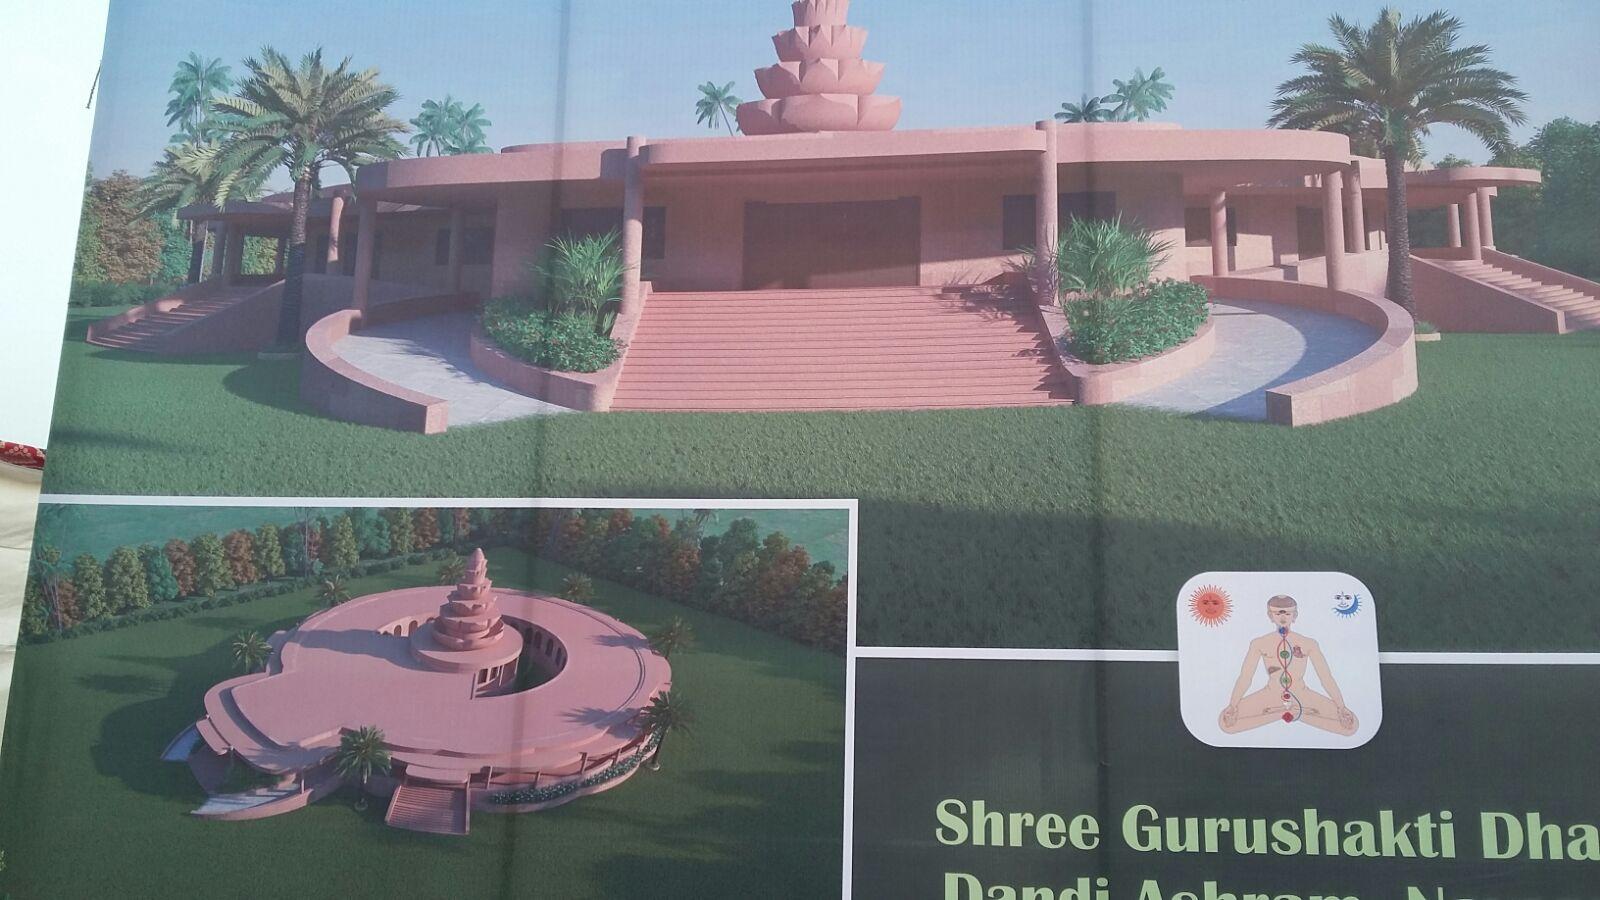 swami shree shivkrupanand